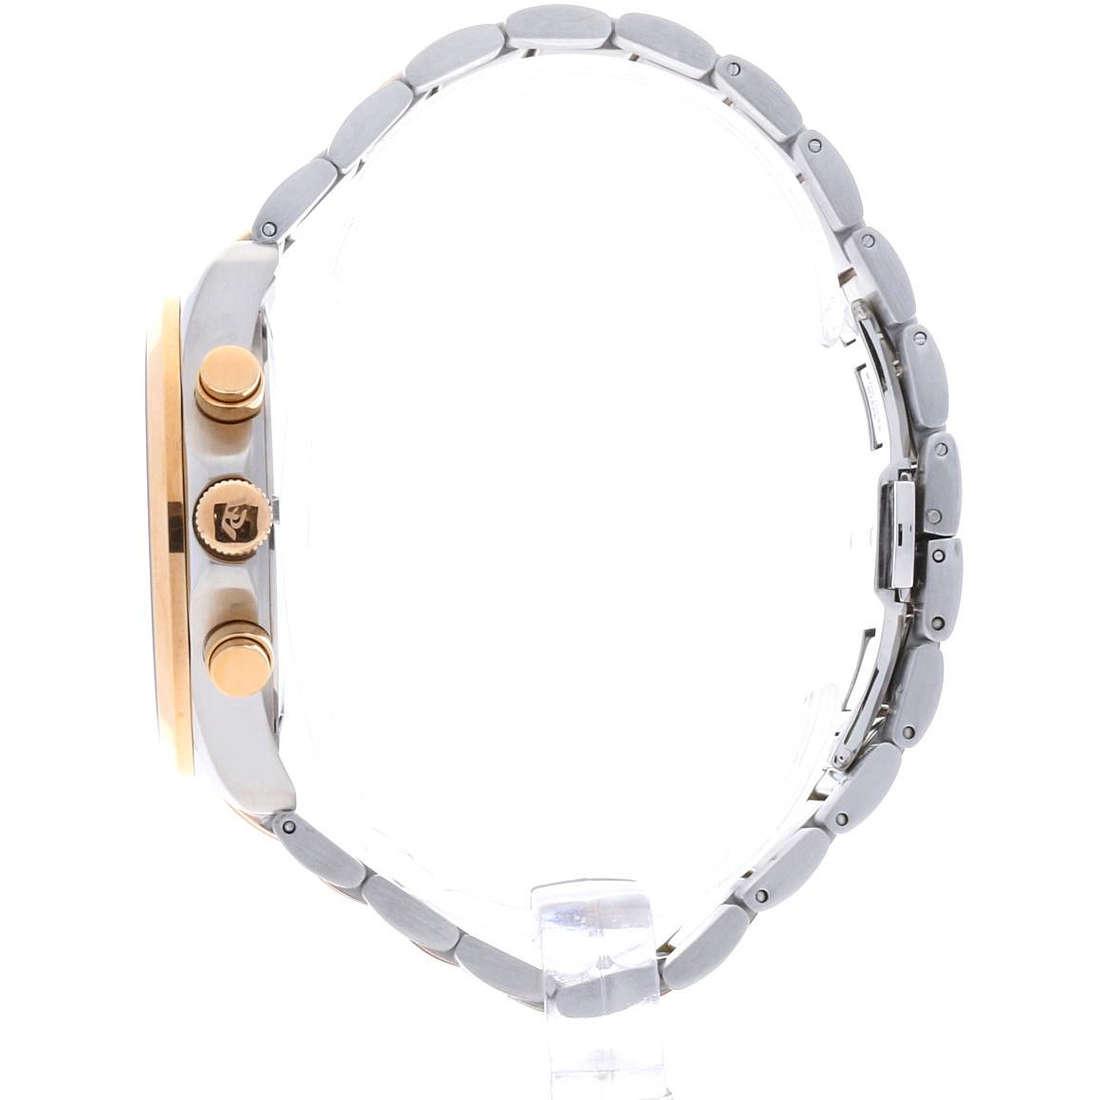 prix montres homme Philip Watch R8273665001